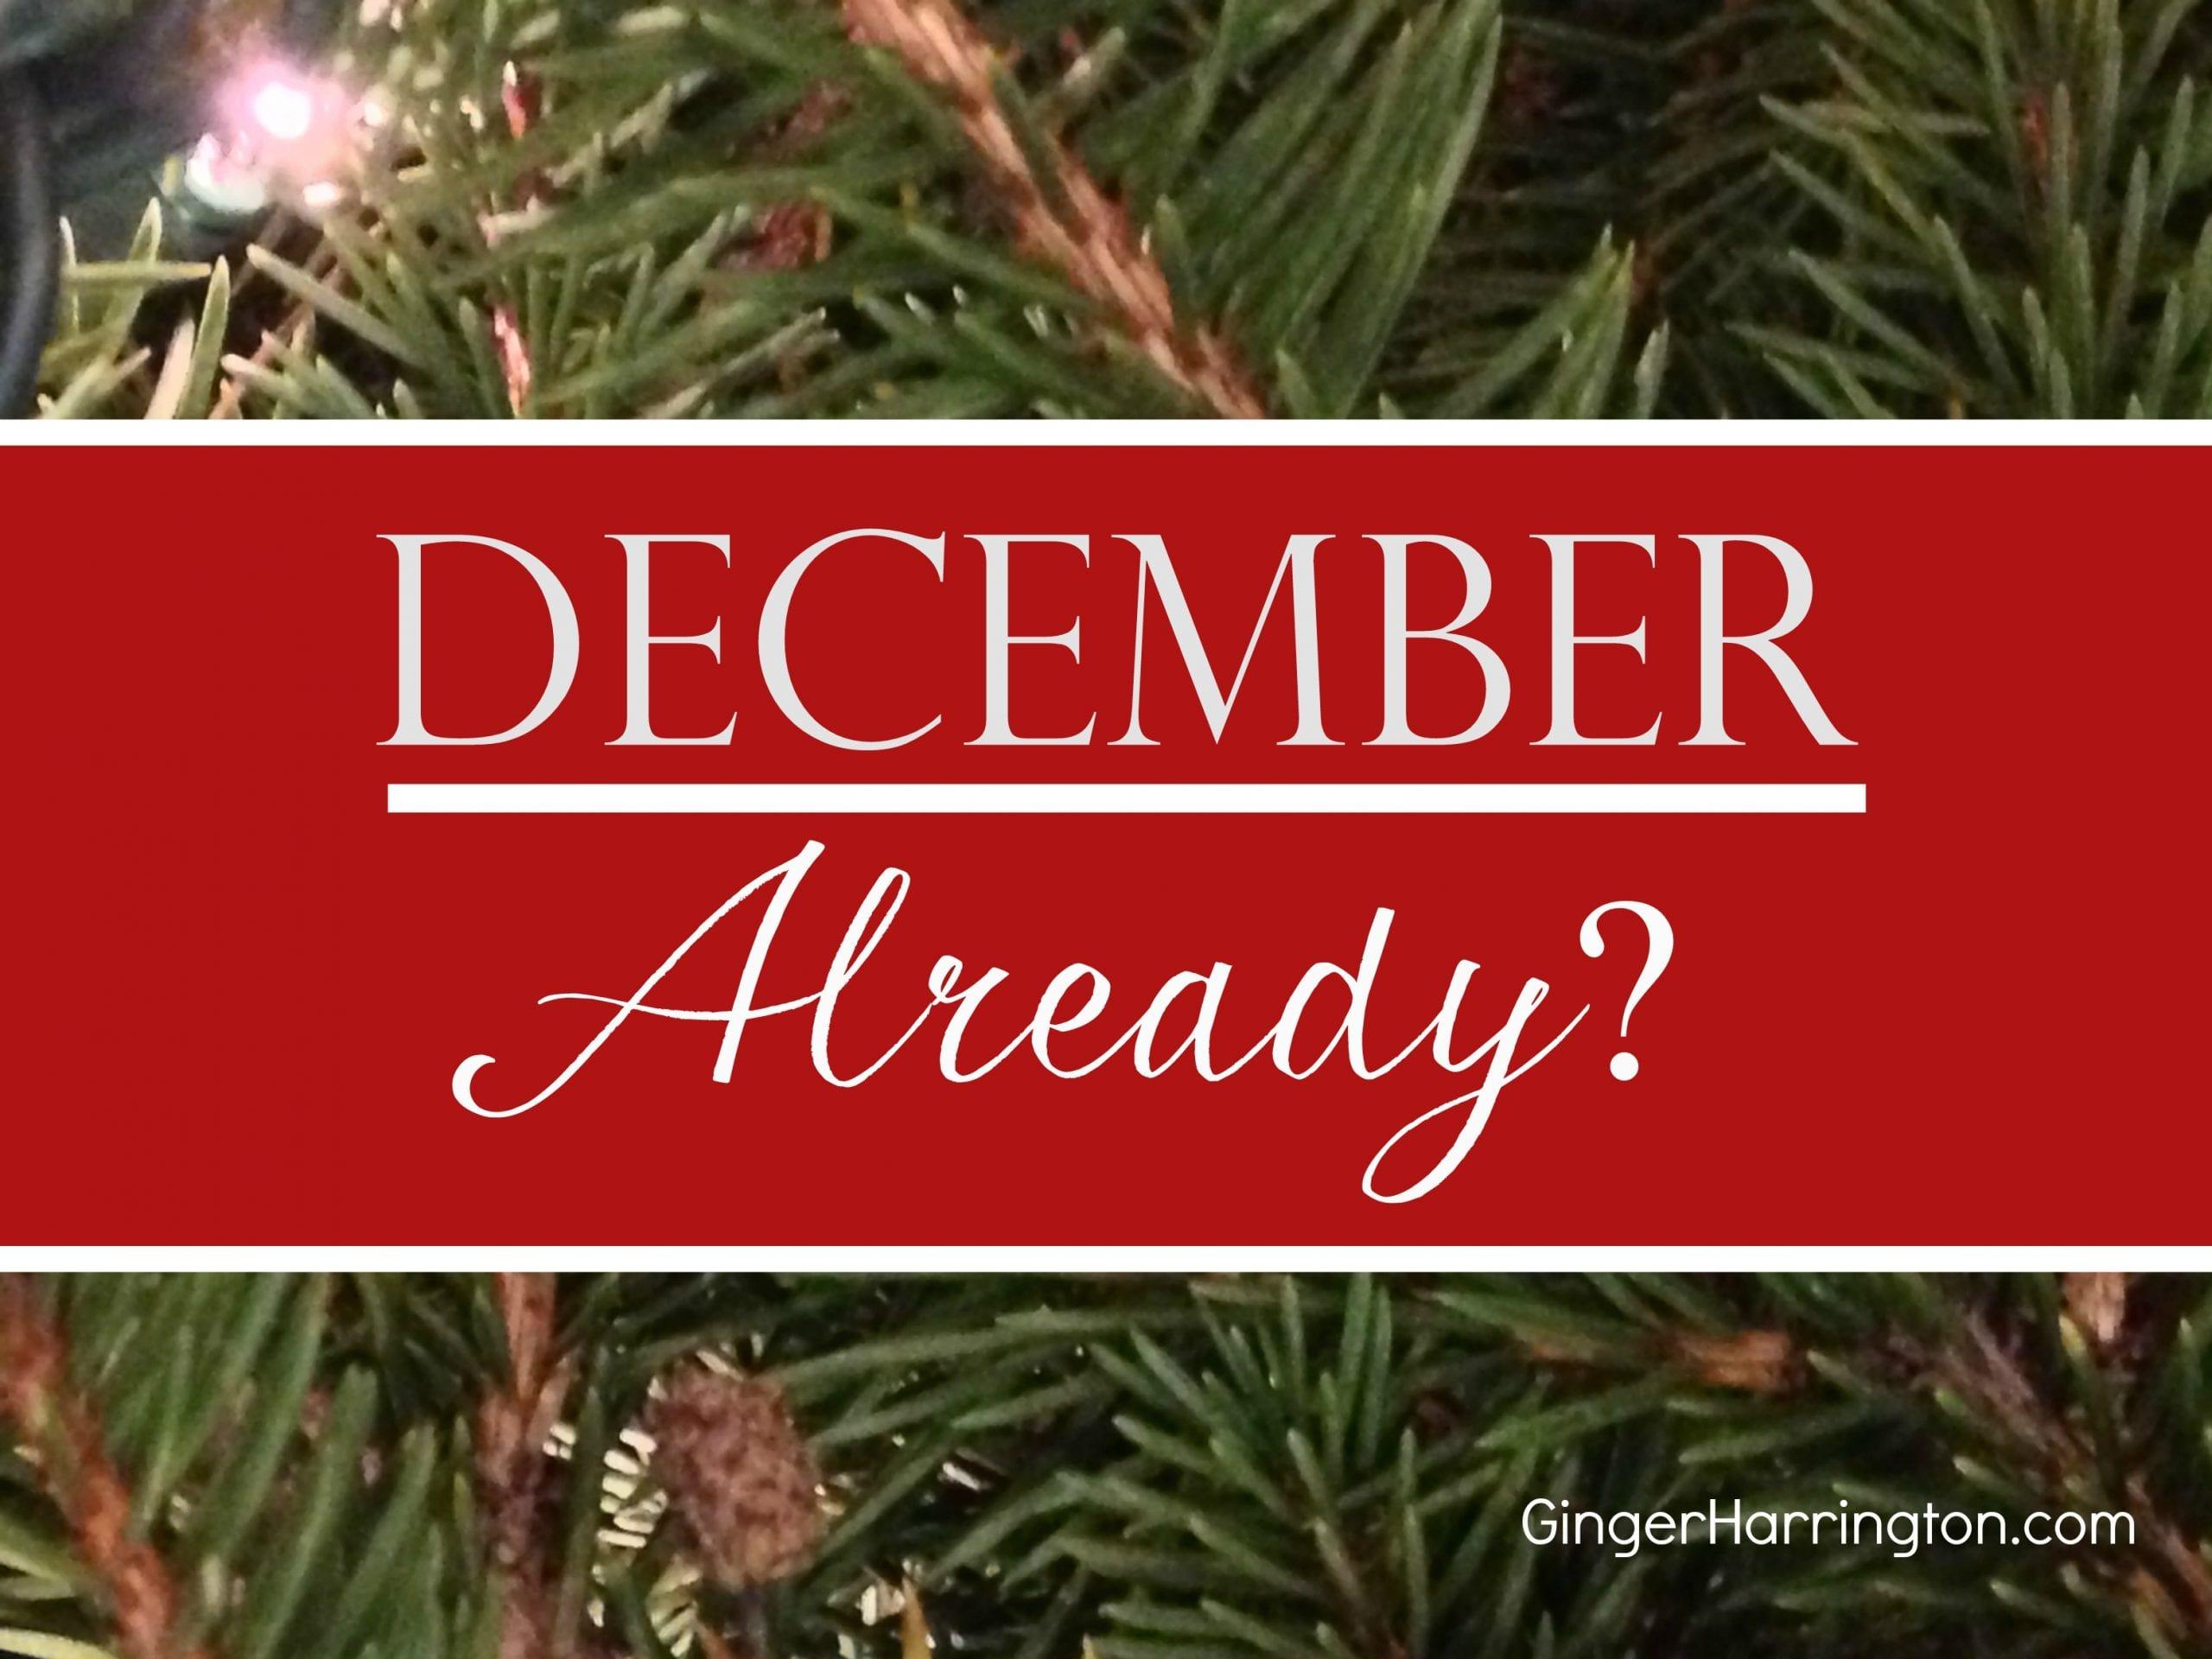 December Already?